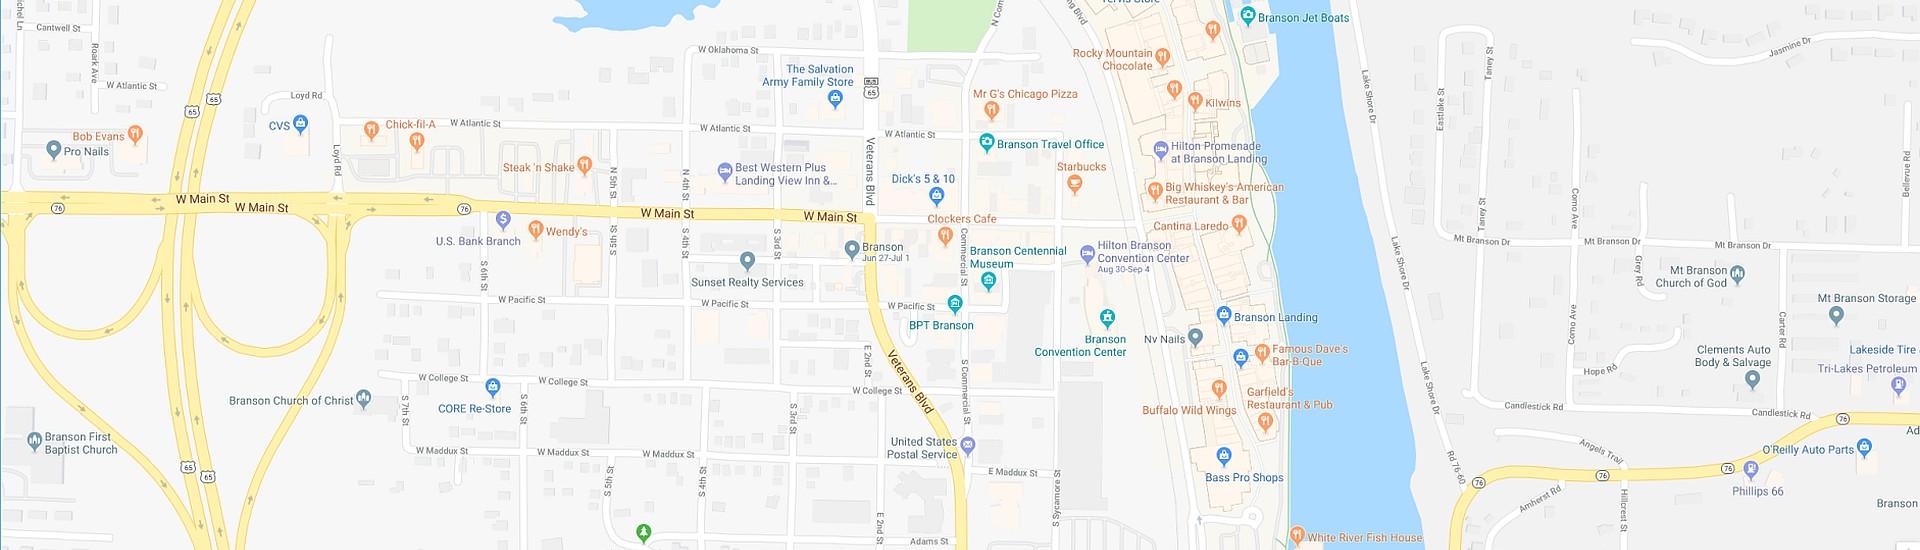 FREE Branson 2019 Map! - Branson Travel Office